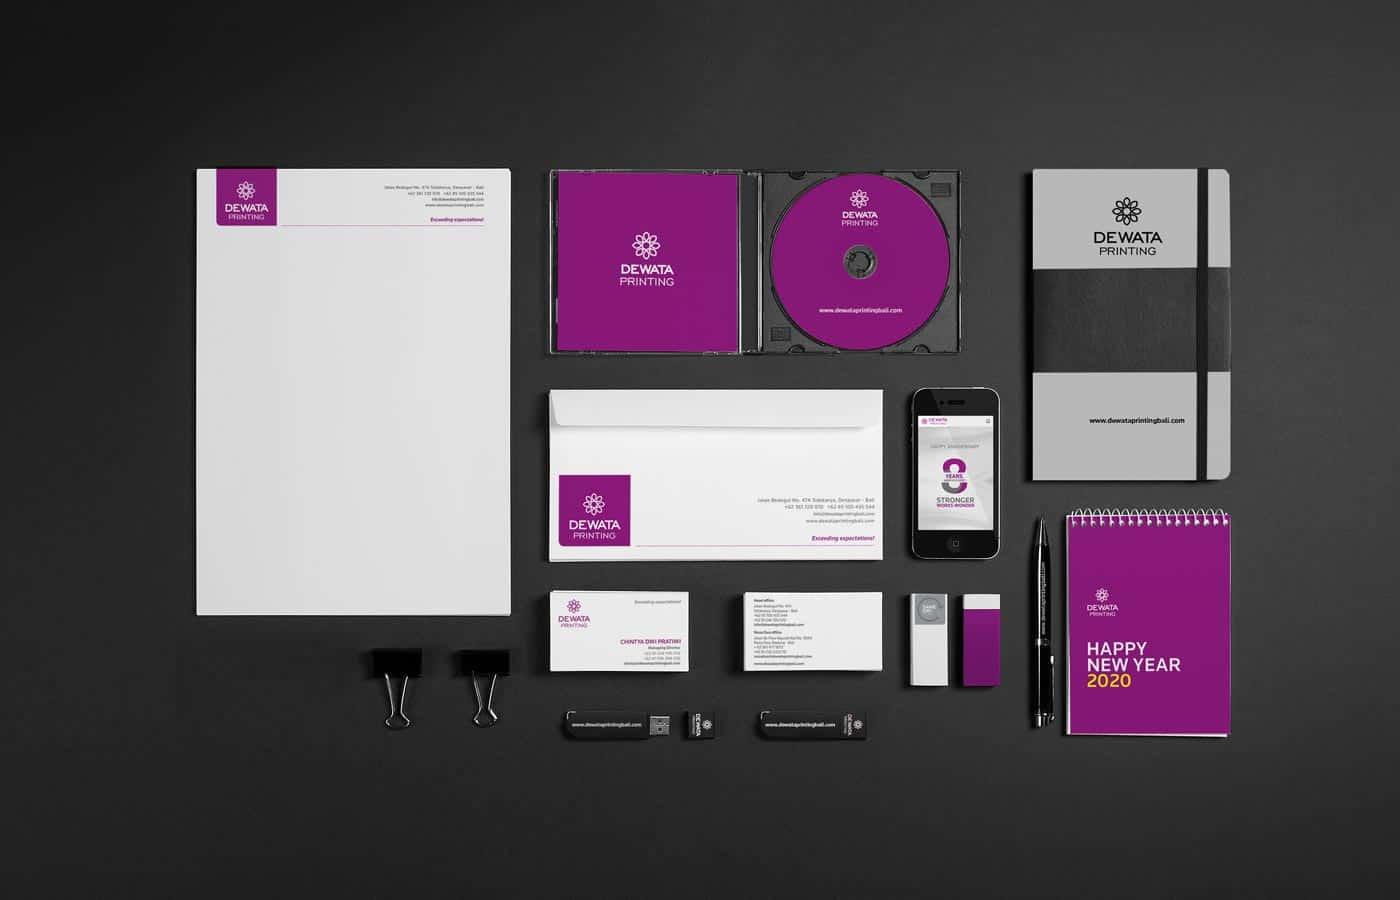 610designs - branding dewata printing